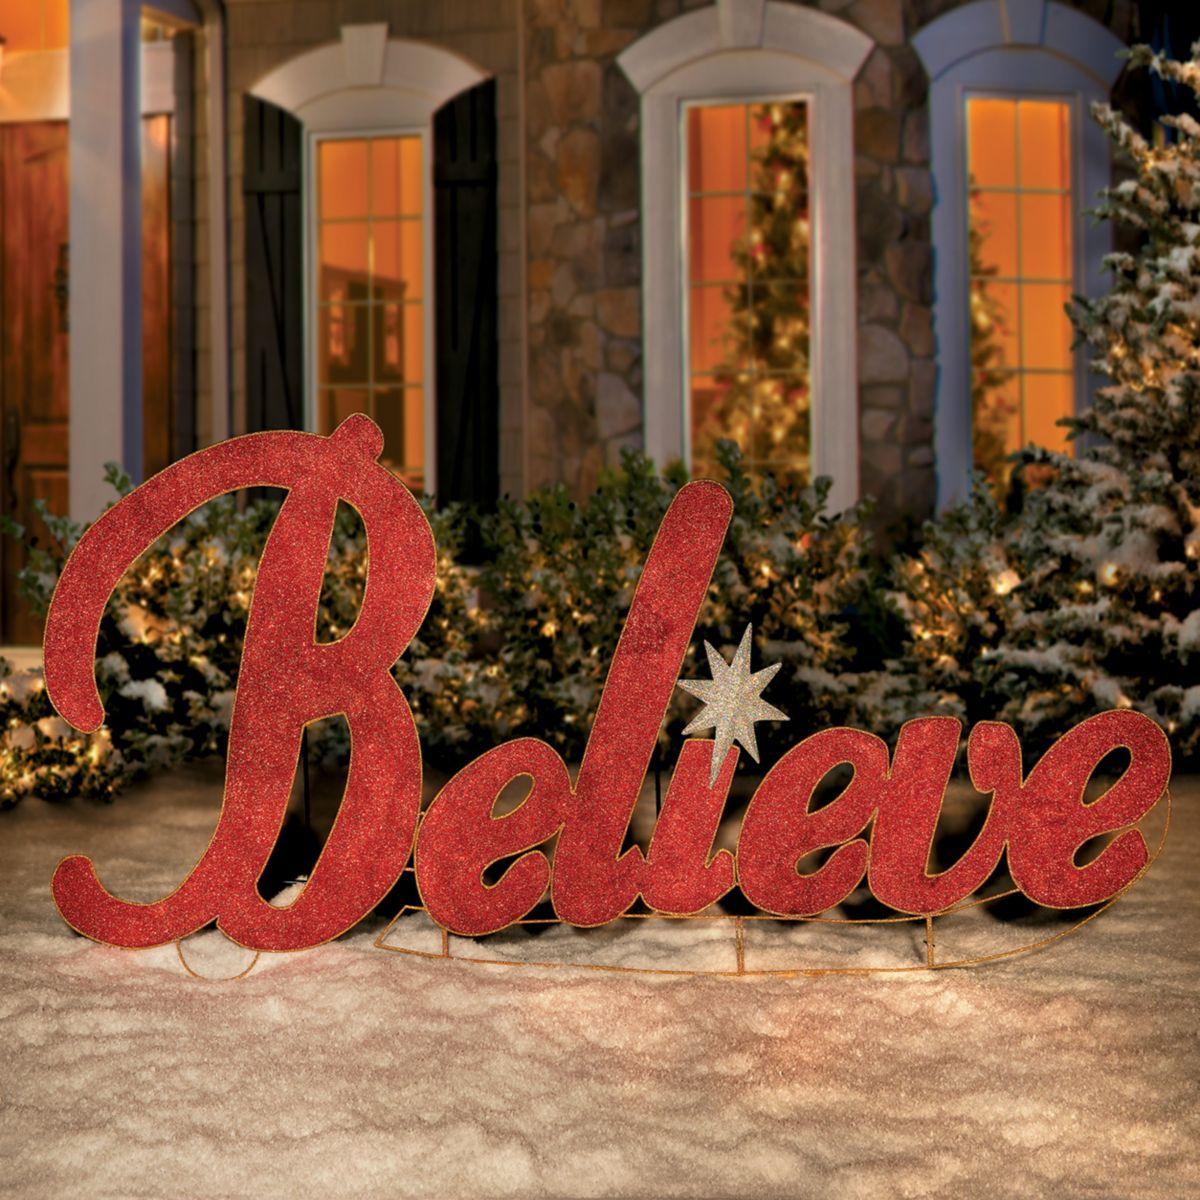 Metal Believe Christmas Yard Decor Christmas Yard Decorations Outdoor Christmas Decorations Christmas Decorations